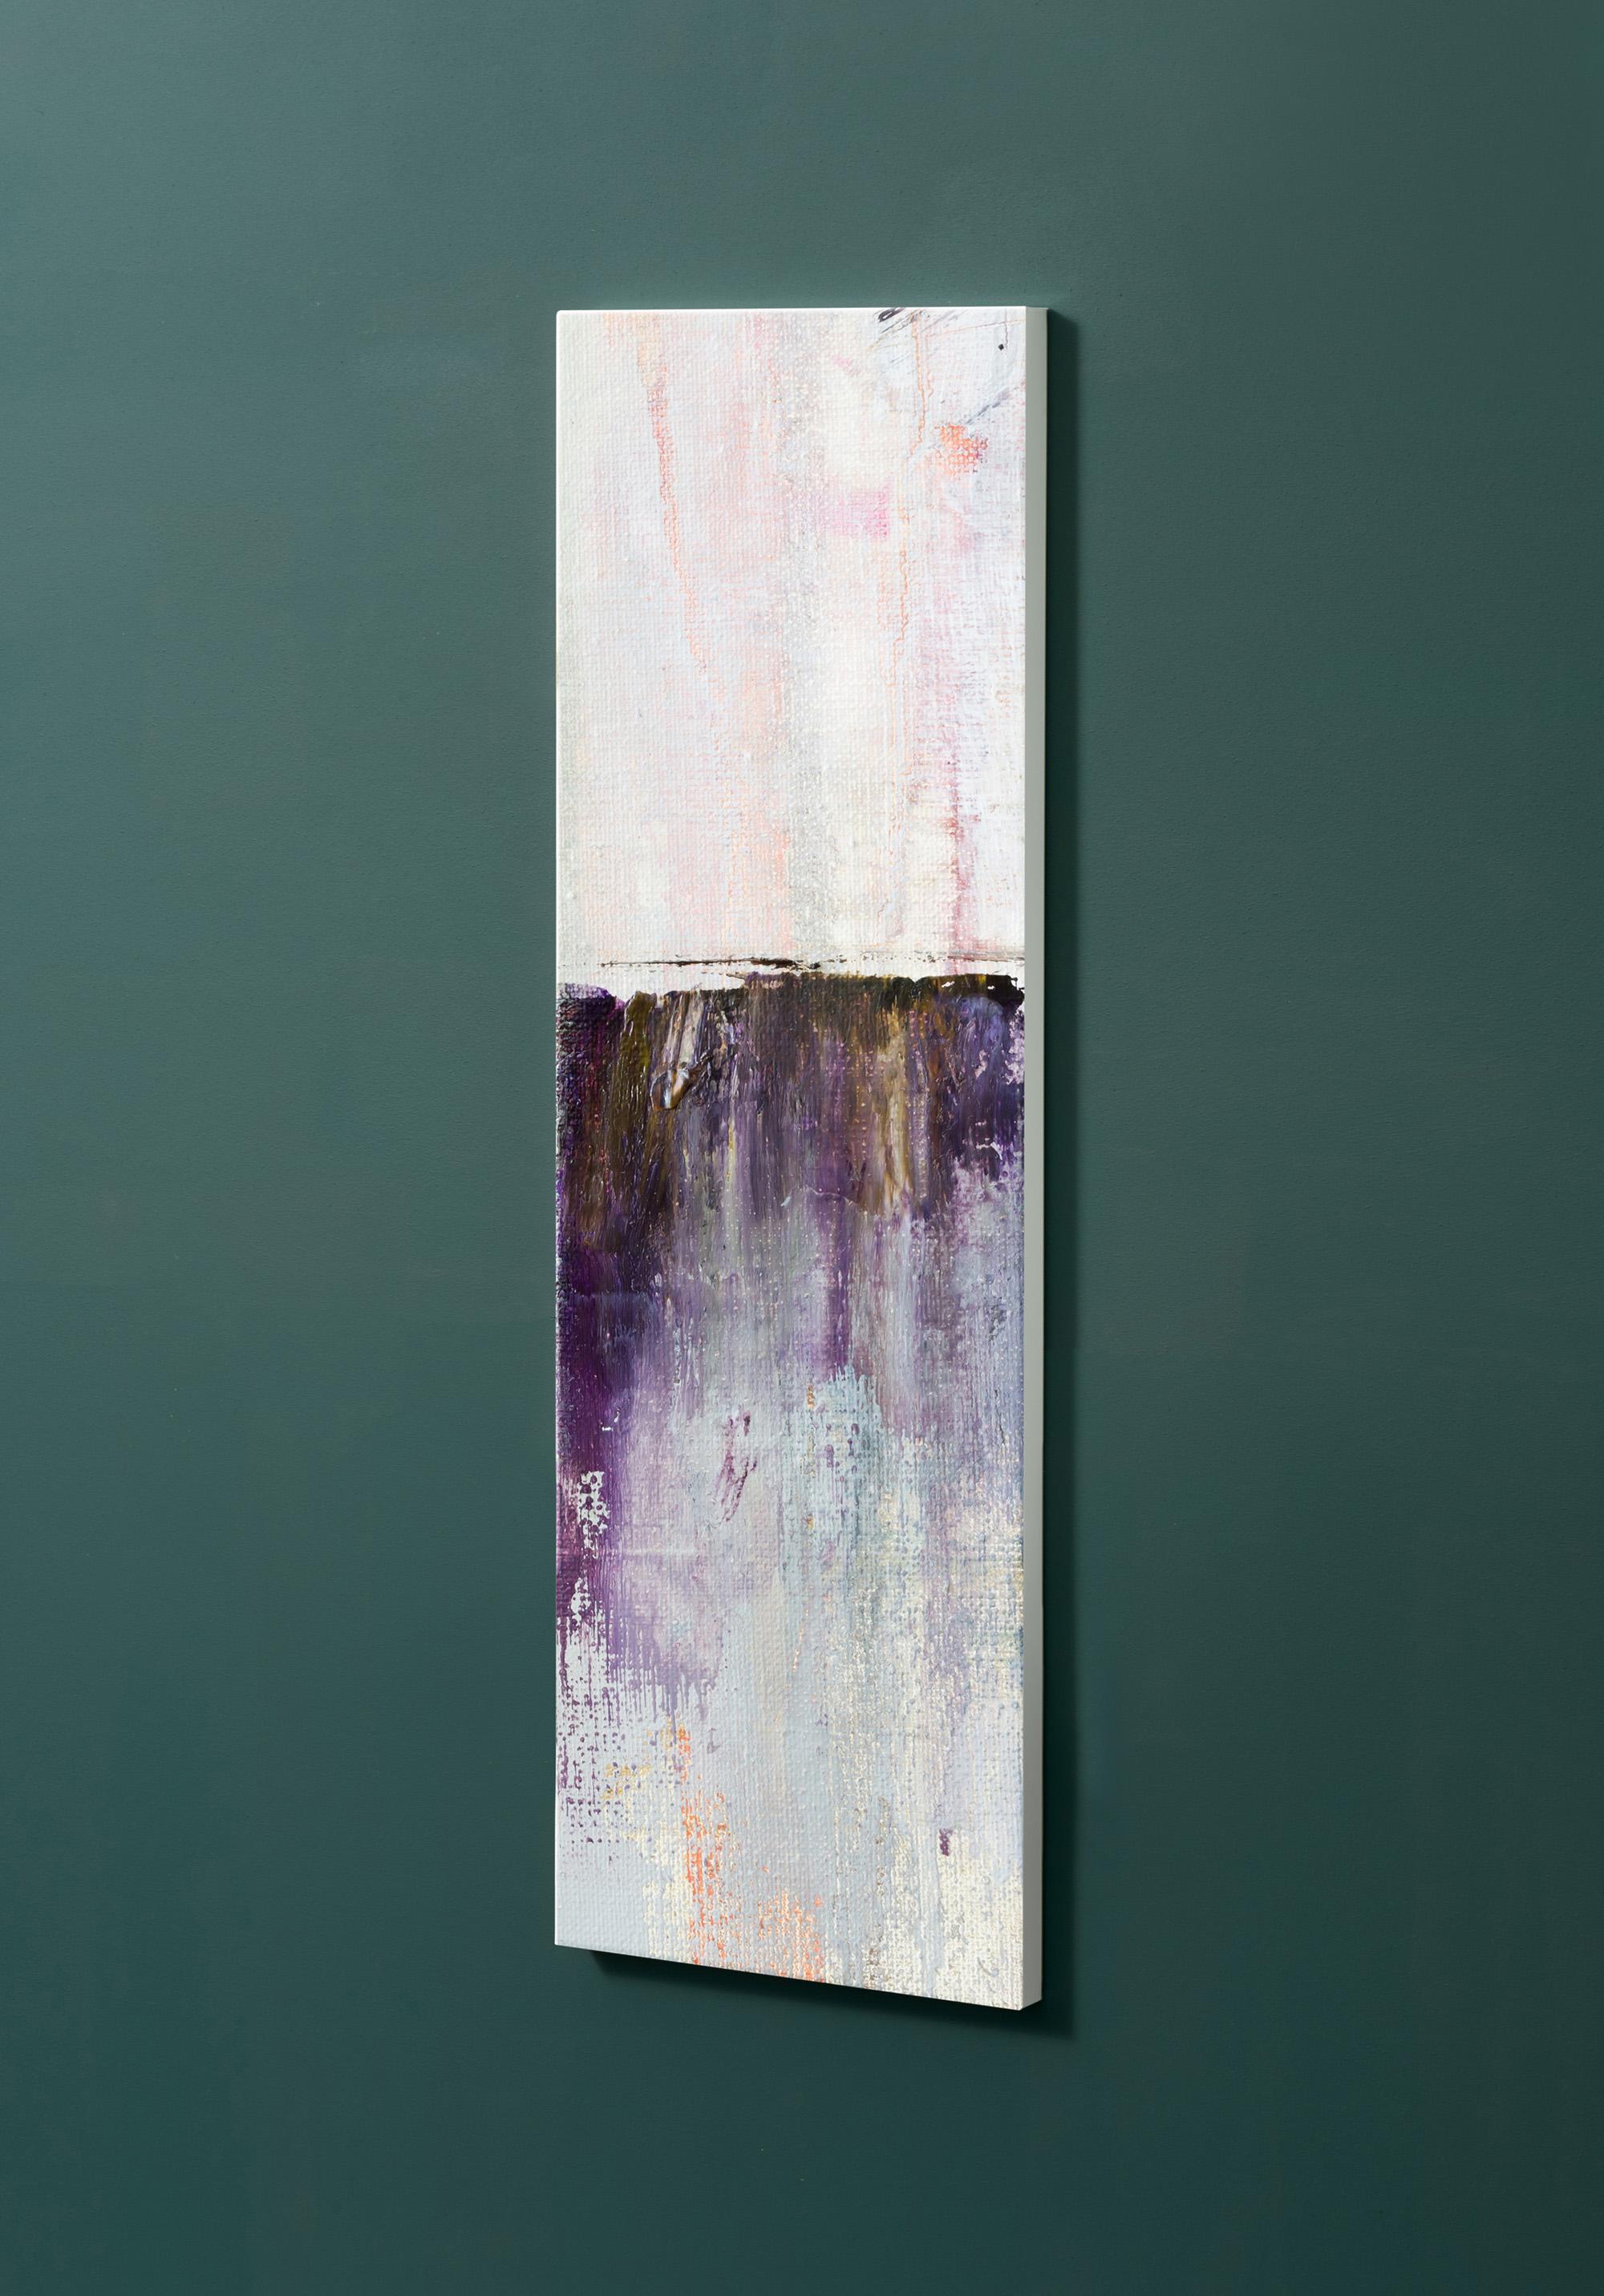 Magnettafel NOTIZ 30x90cm Motiv-Pinnwand M108 Abstrakt Kunst